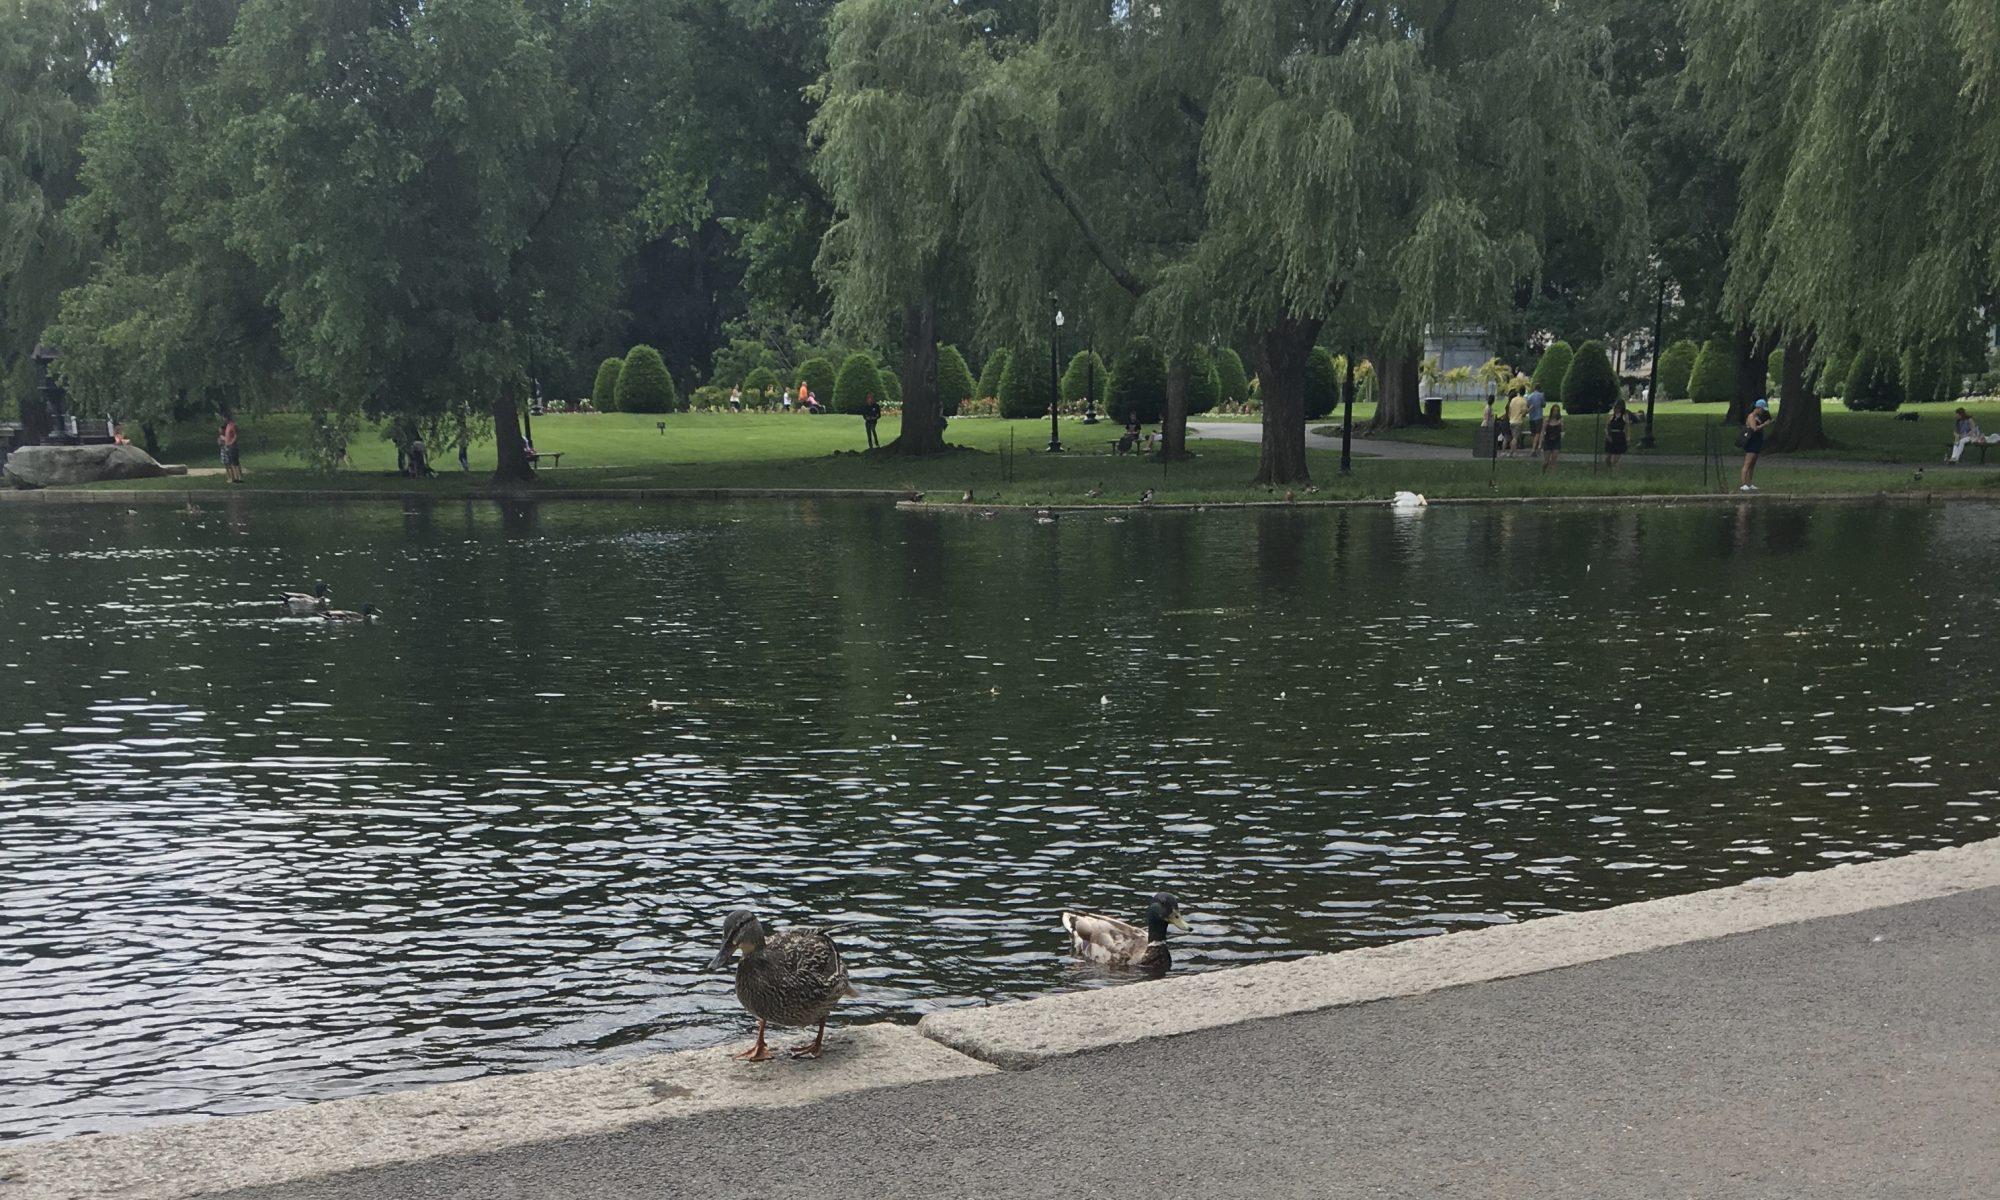 wandering in Boston so many stories